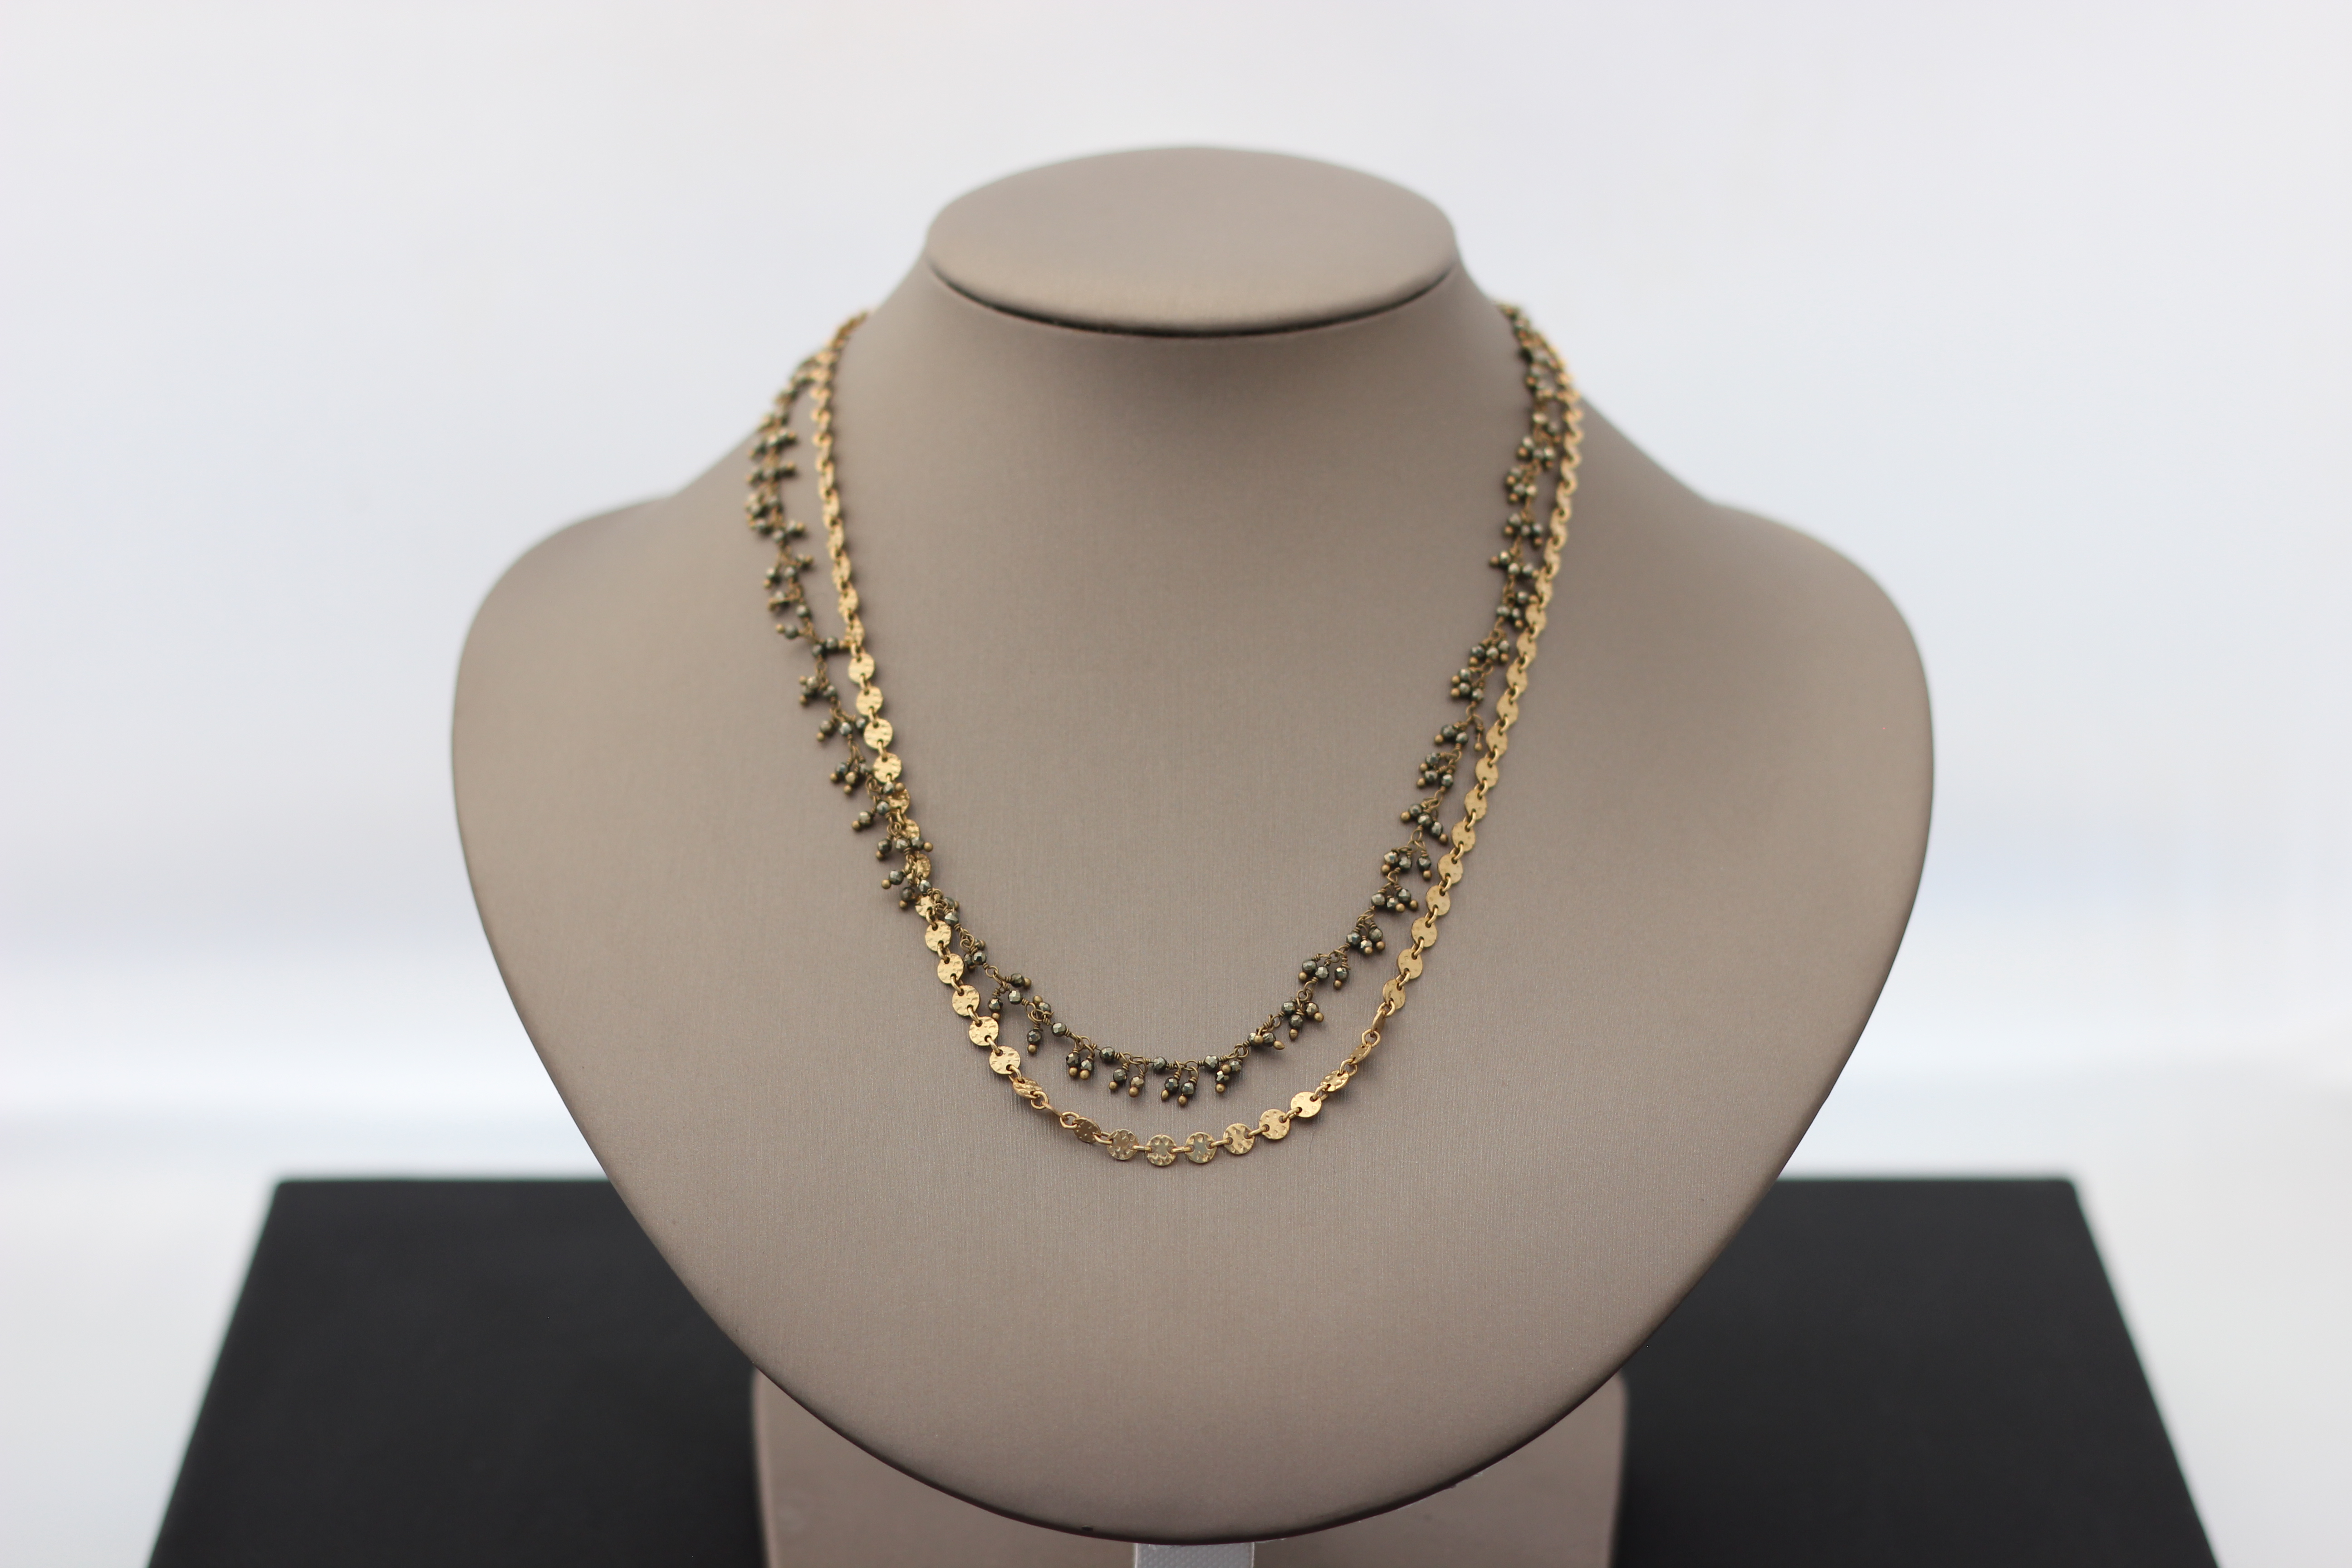 15. Convertible Short/Long, Gold and Pyrite | $198